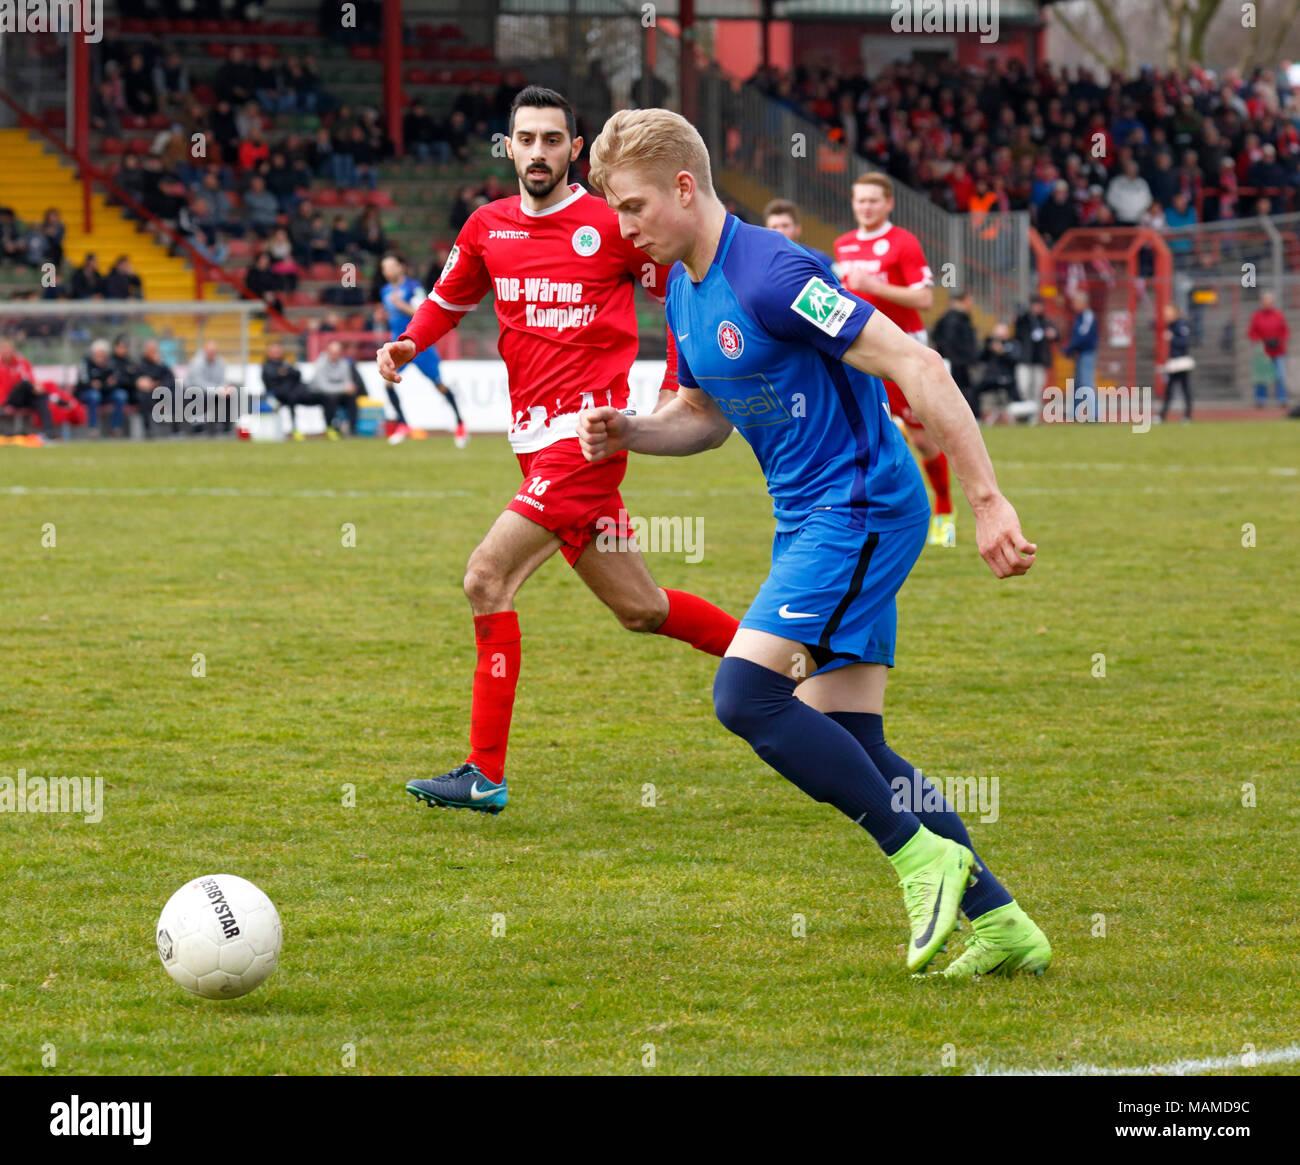 sports, football, Regional League West, 2017/2018, Rot Weiss Oberhausen vs Wuppertaler SV 1:1, Stadium Niederrhein in Oberhausen, scene of the match, Niklas Heidemann (WSV) in ball possession, behind Rafael Garcia (WSV) - Stock Image